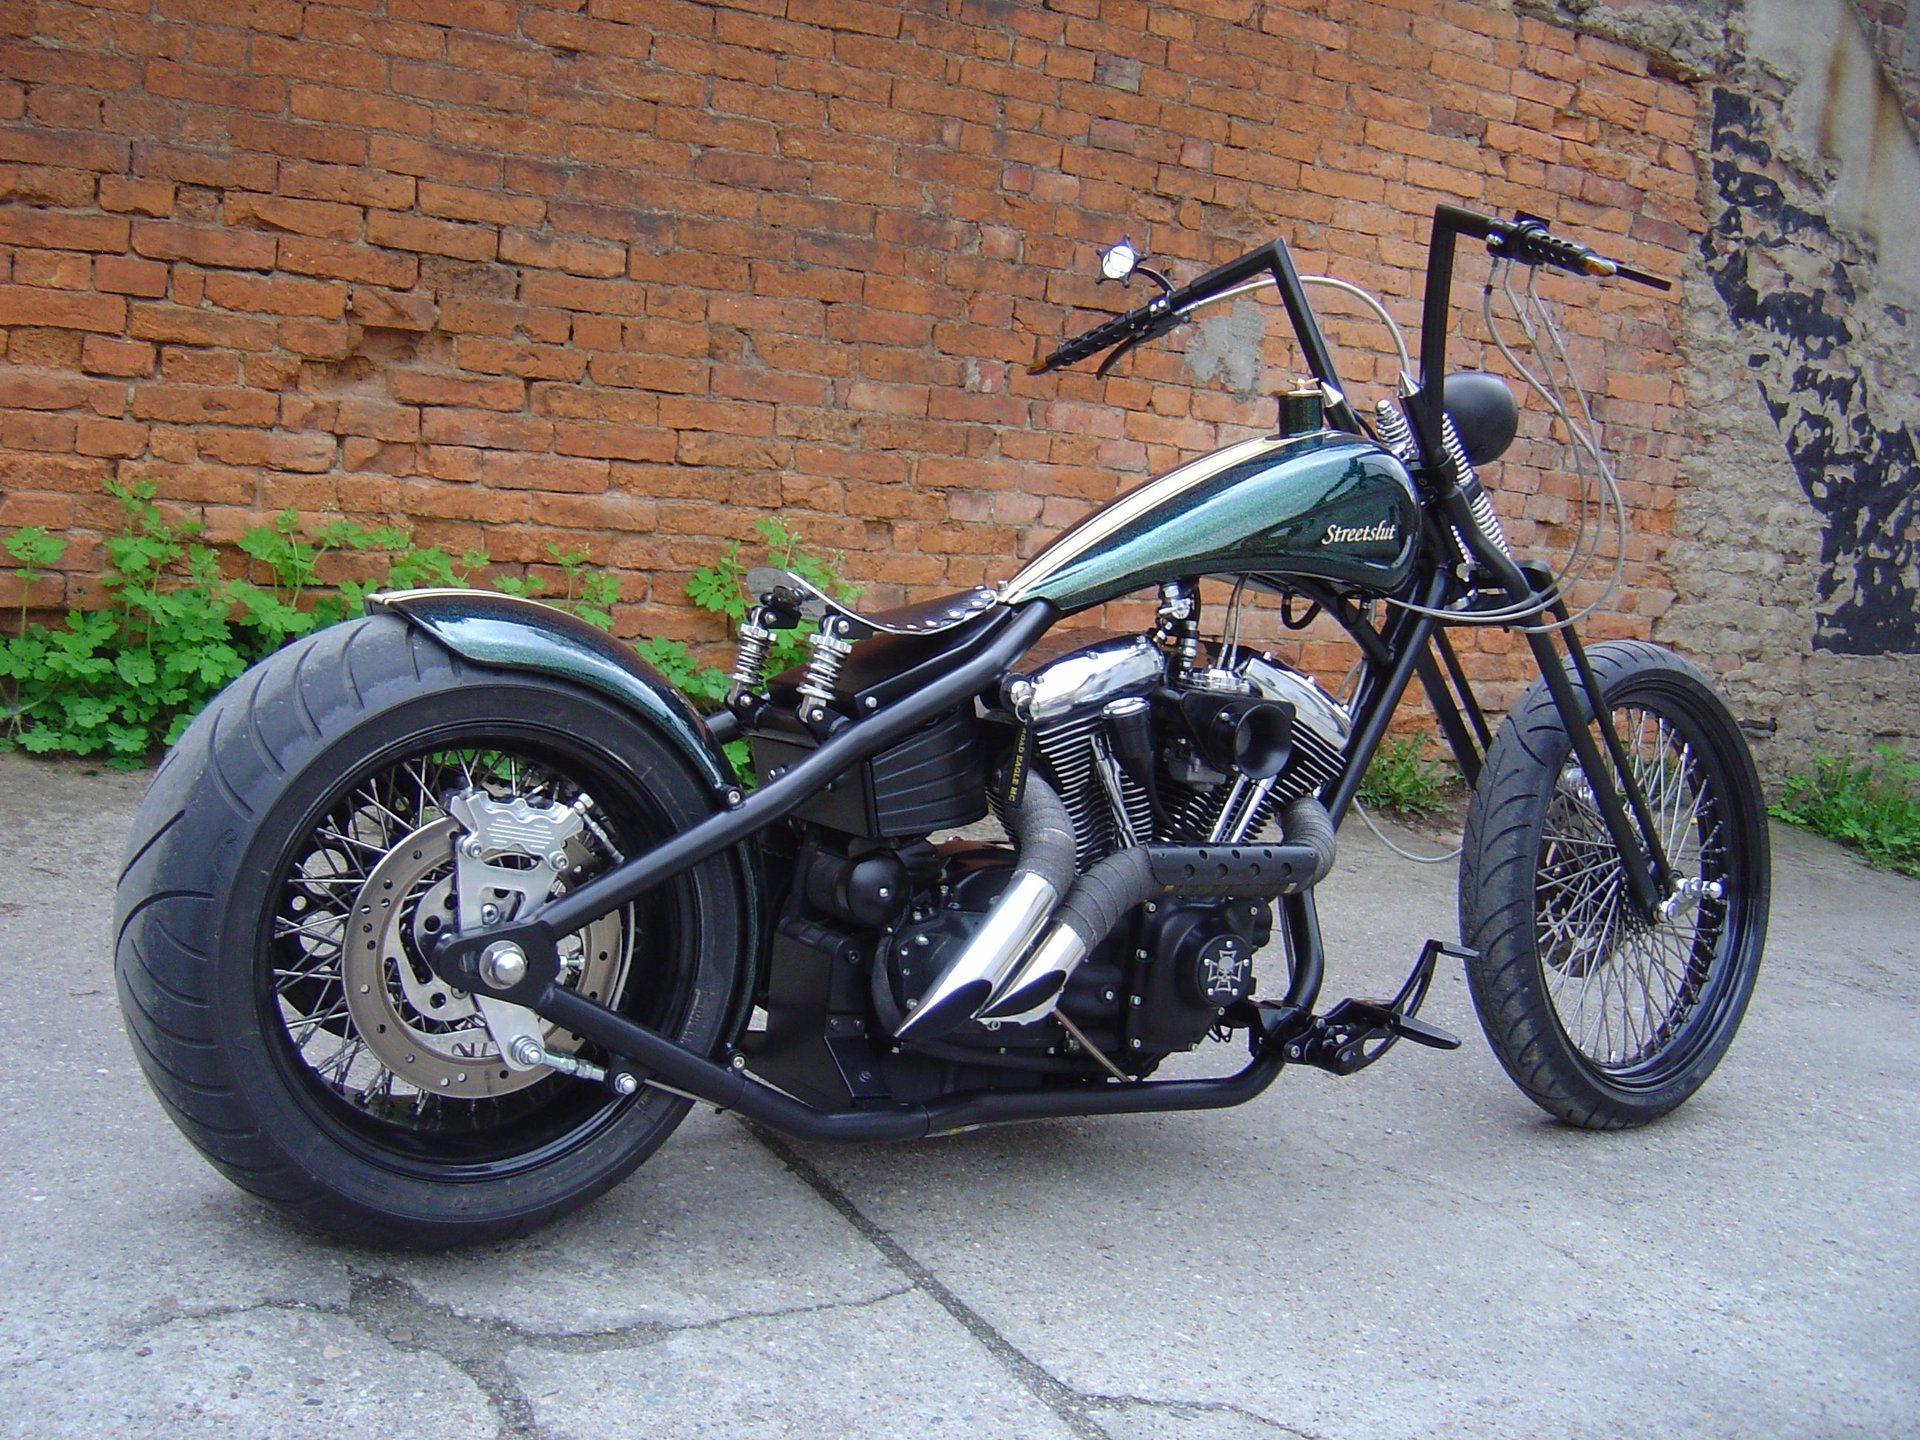 umgebautes motorrad harley davidson dyna street bob fxdb von wild east motorcycles inh dirk. Black Bedroom Furniture Sets. Home Design Ideas